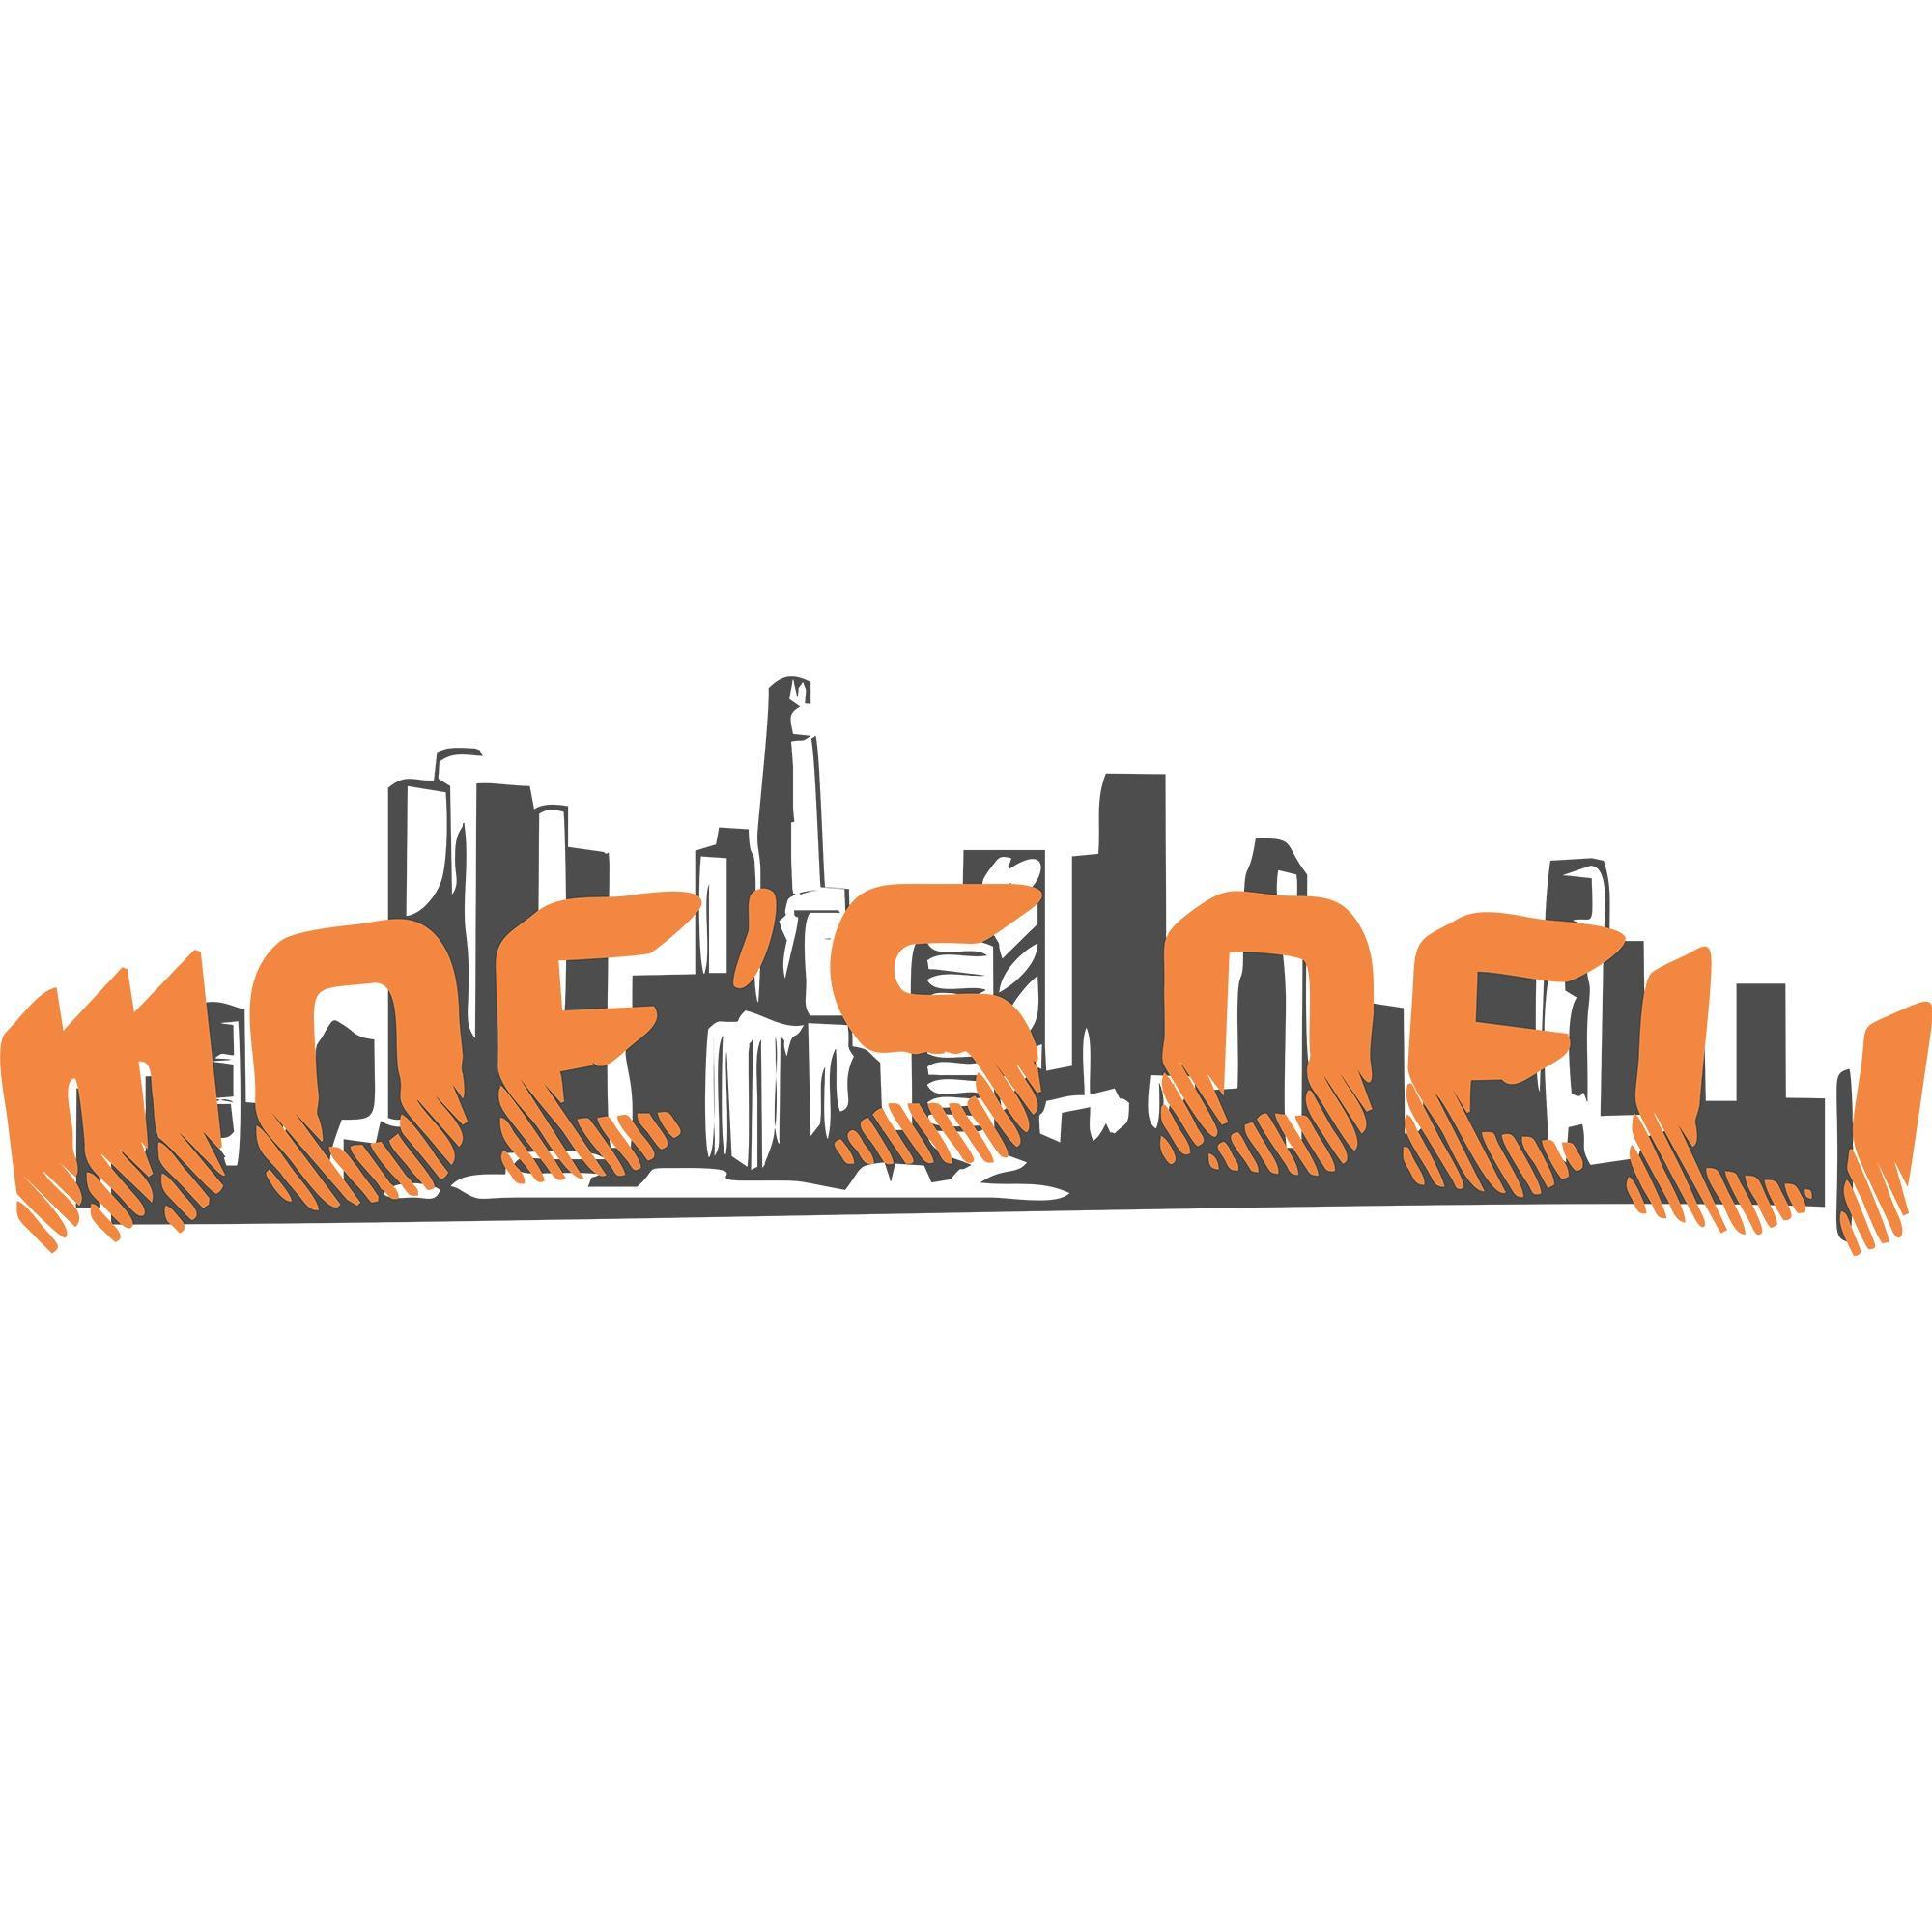 Moe's Deli & Catering